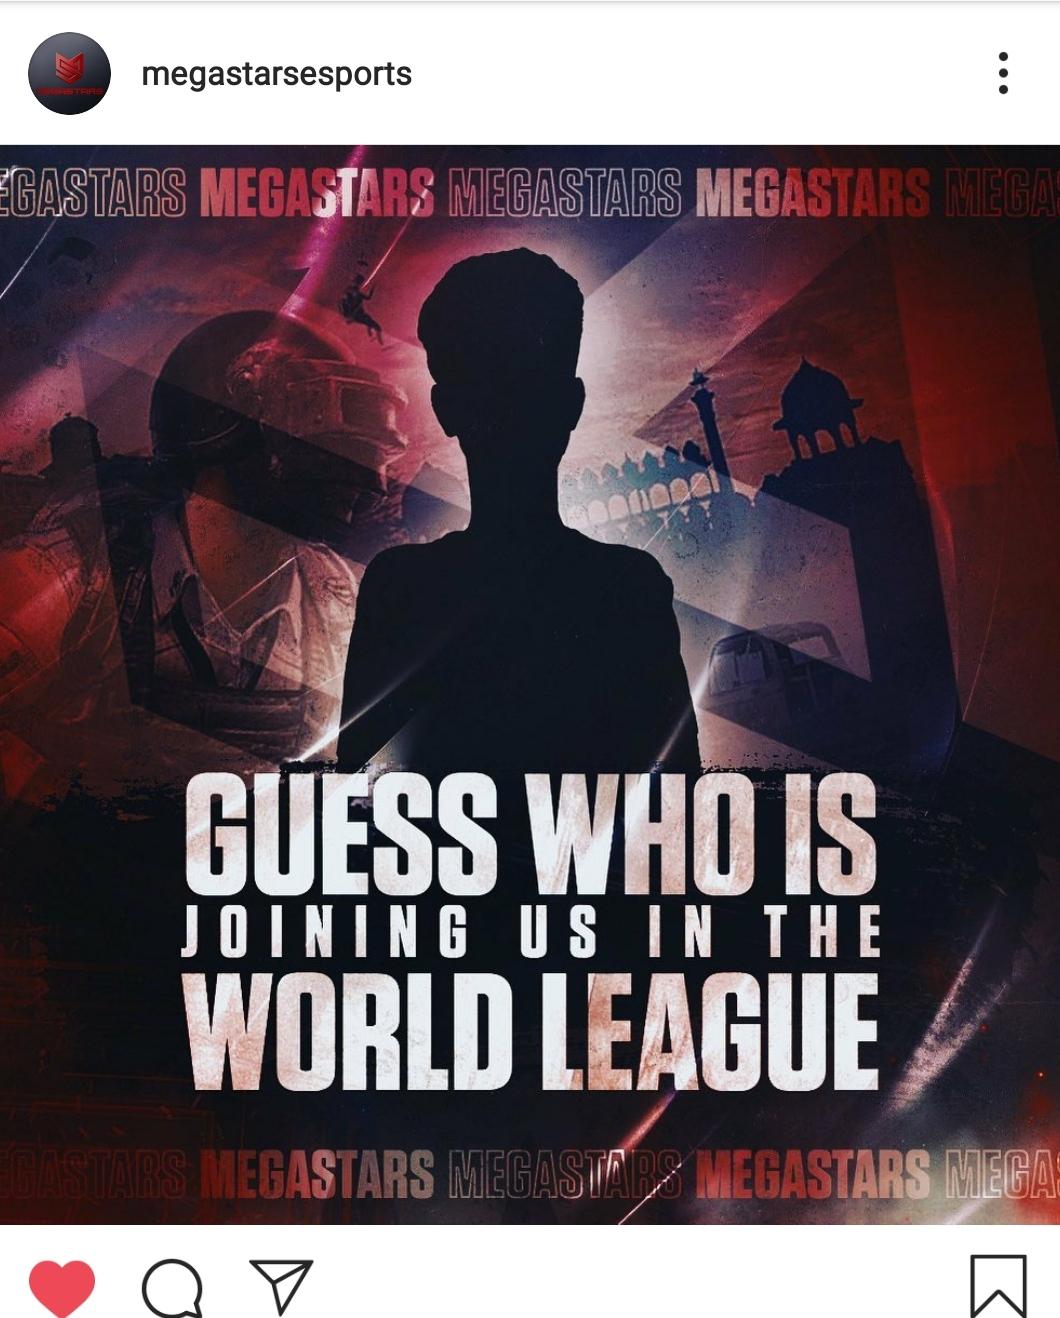 Owais joining mega